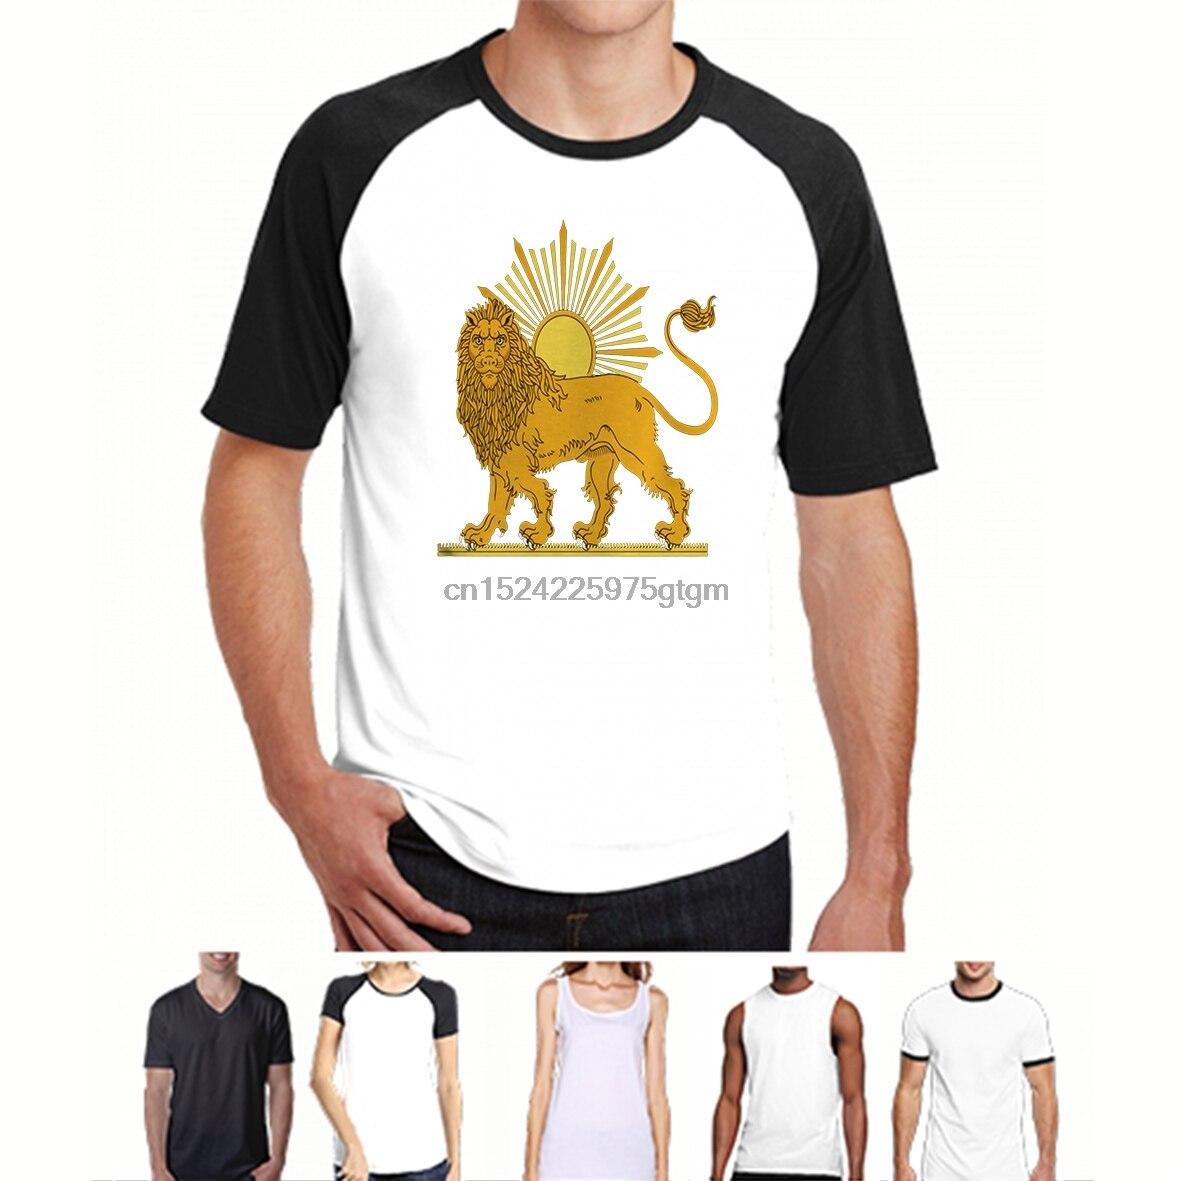 91e05acc333f Funny Men t shirt Women novelty tshirt Shiro Khorshid IRAN cool T-Shirt